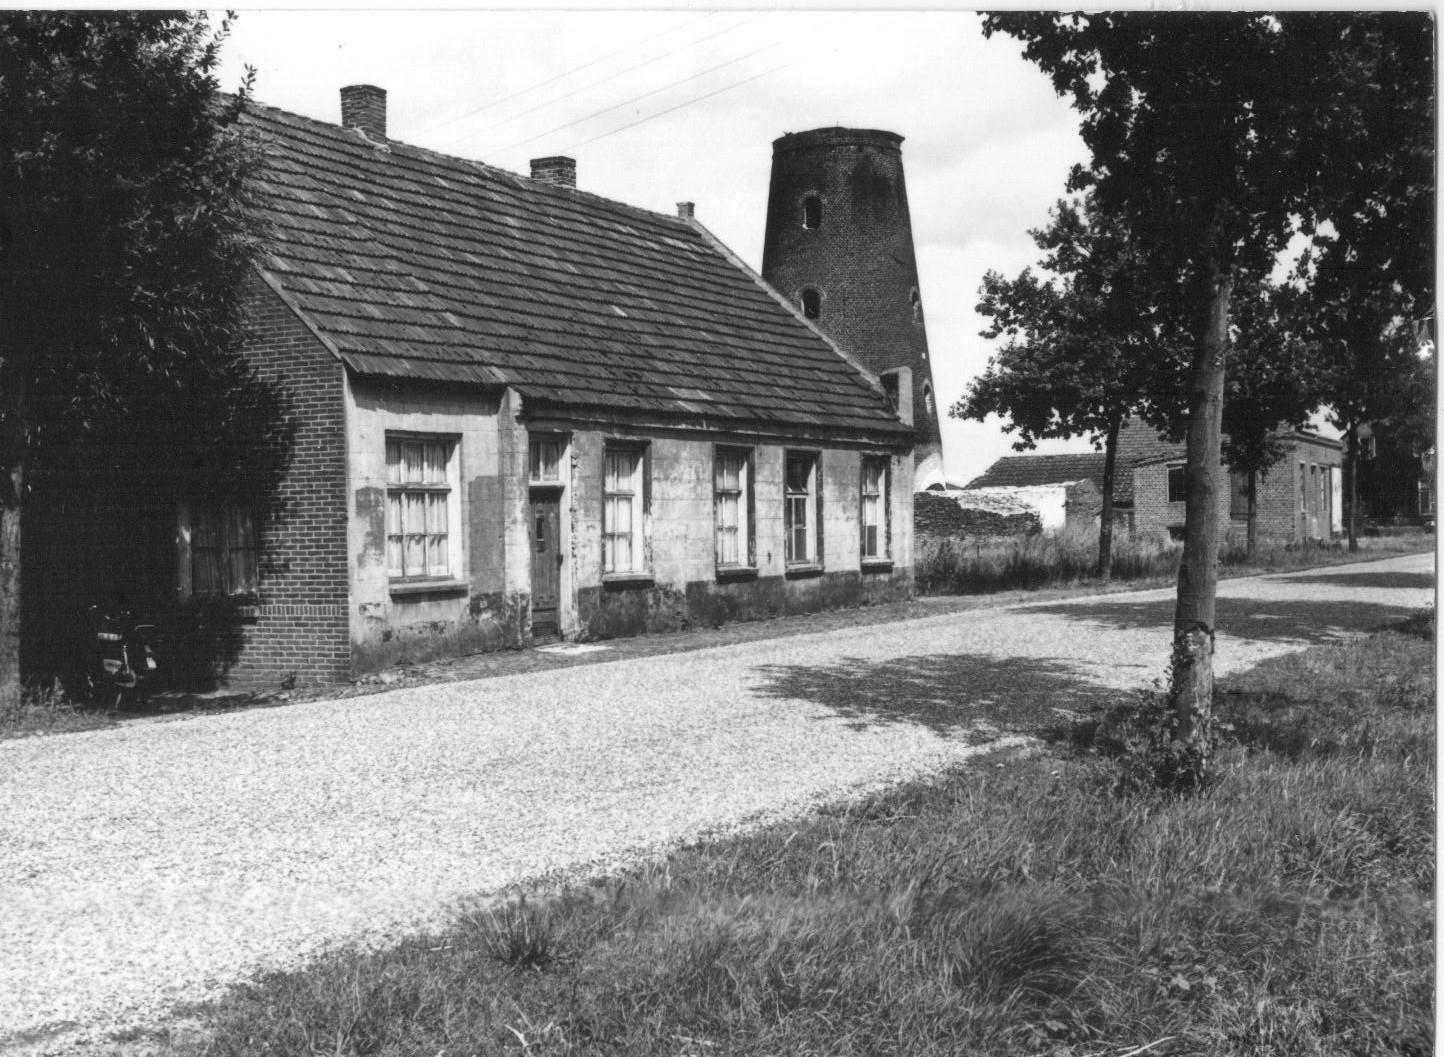 Datering 1970. Molen vd Bosch.